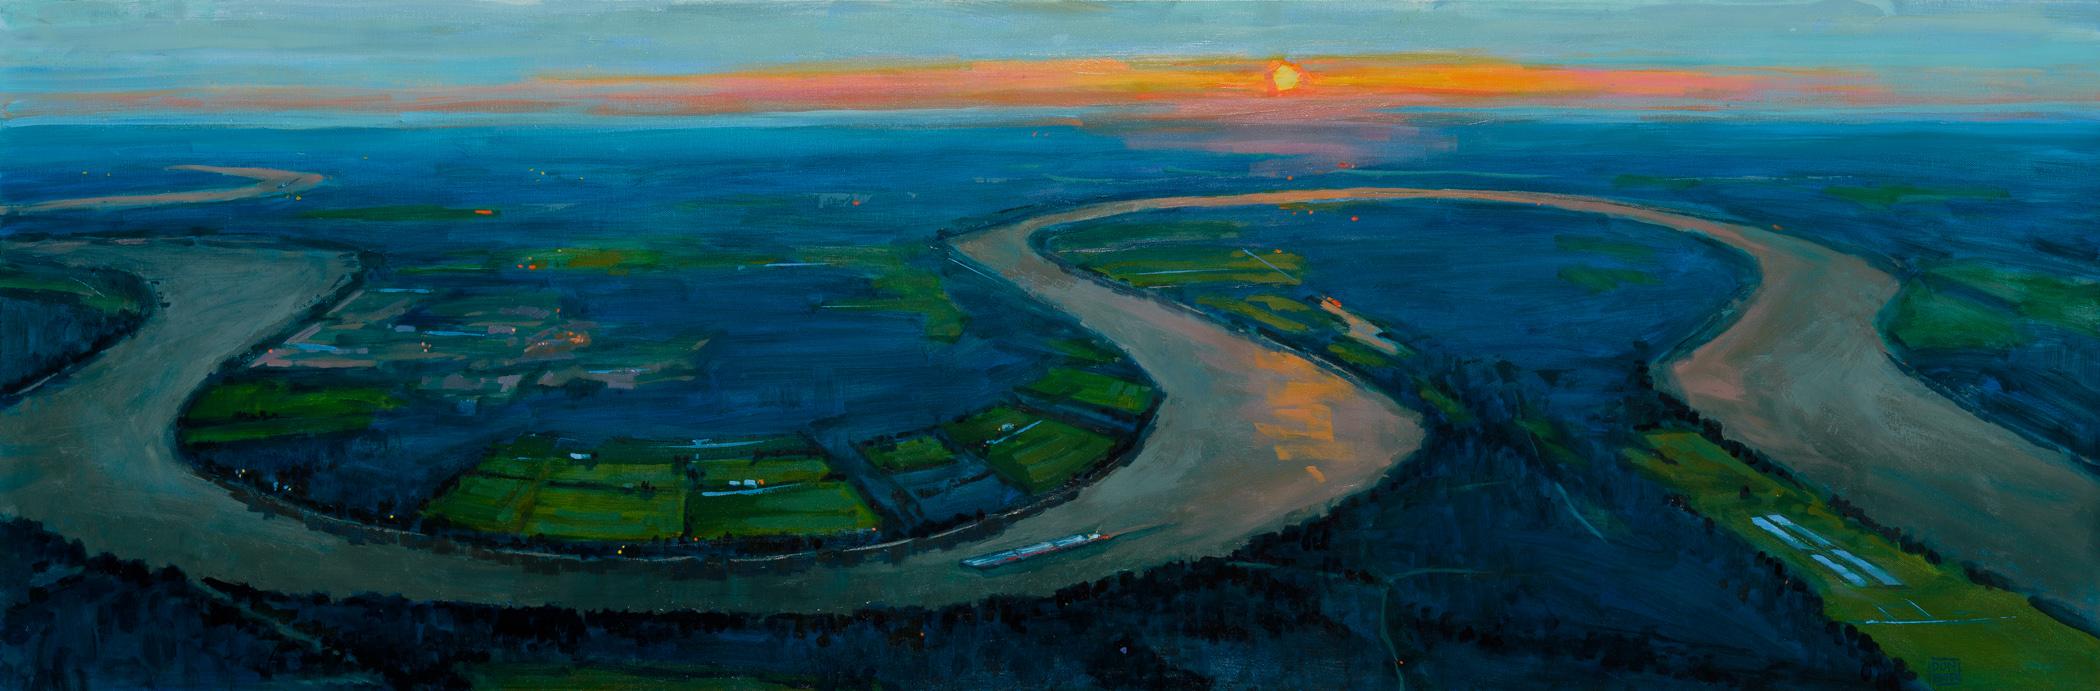 """Twisting the Night Away"" by Lynn Dunbar Bayus, Oil canvas paint, 20x60in, $3500"